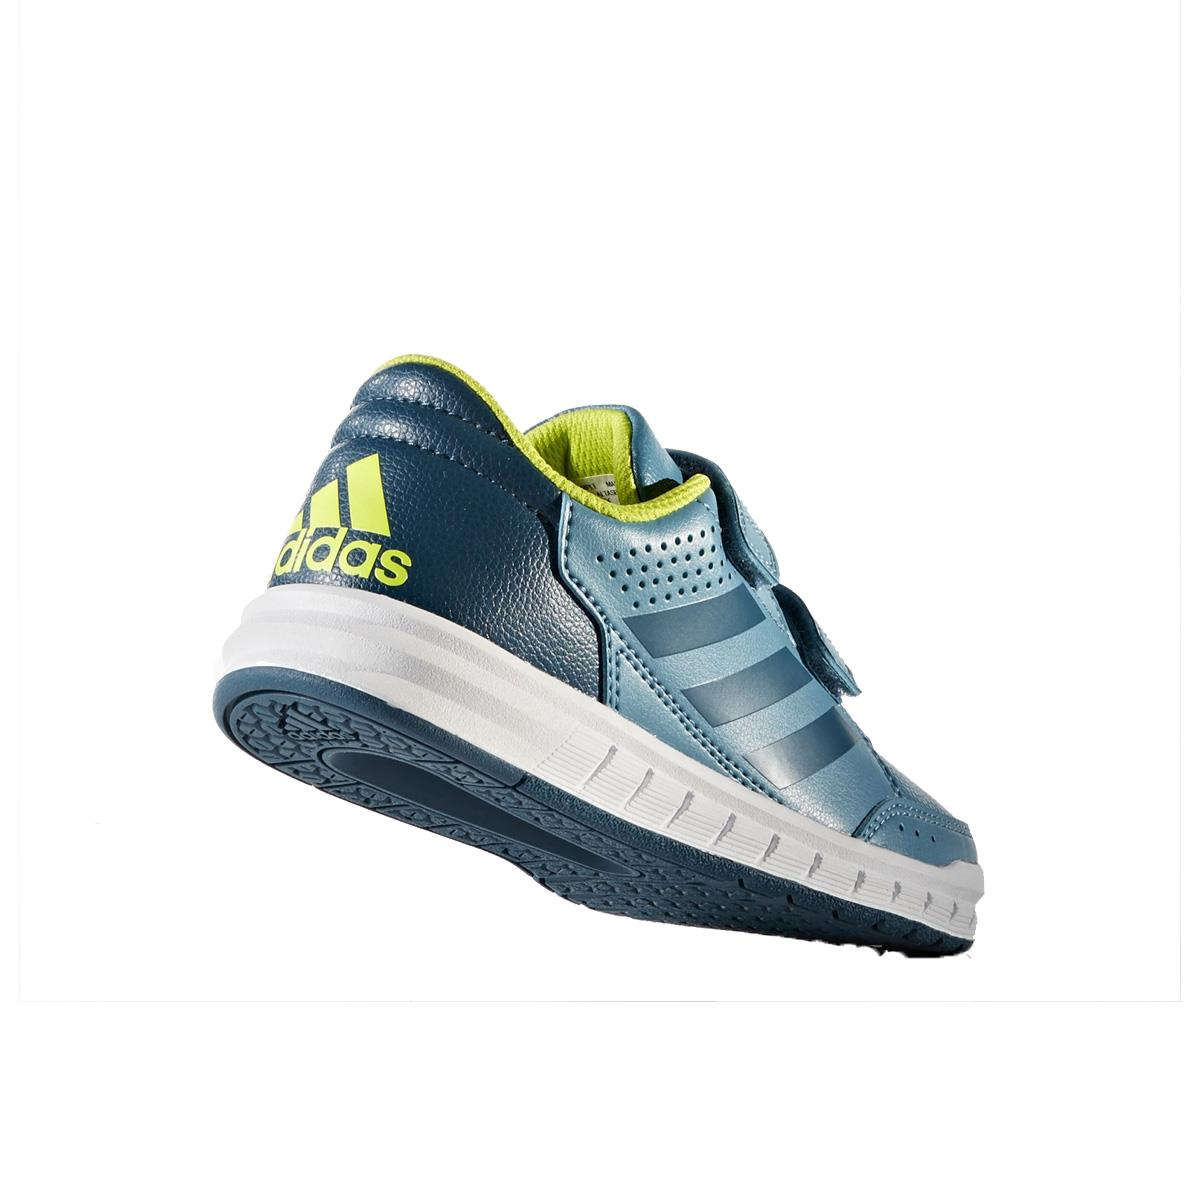 78cfd74dd Tênis Adidas Altasport CF K Infantil